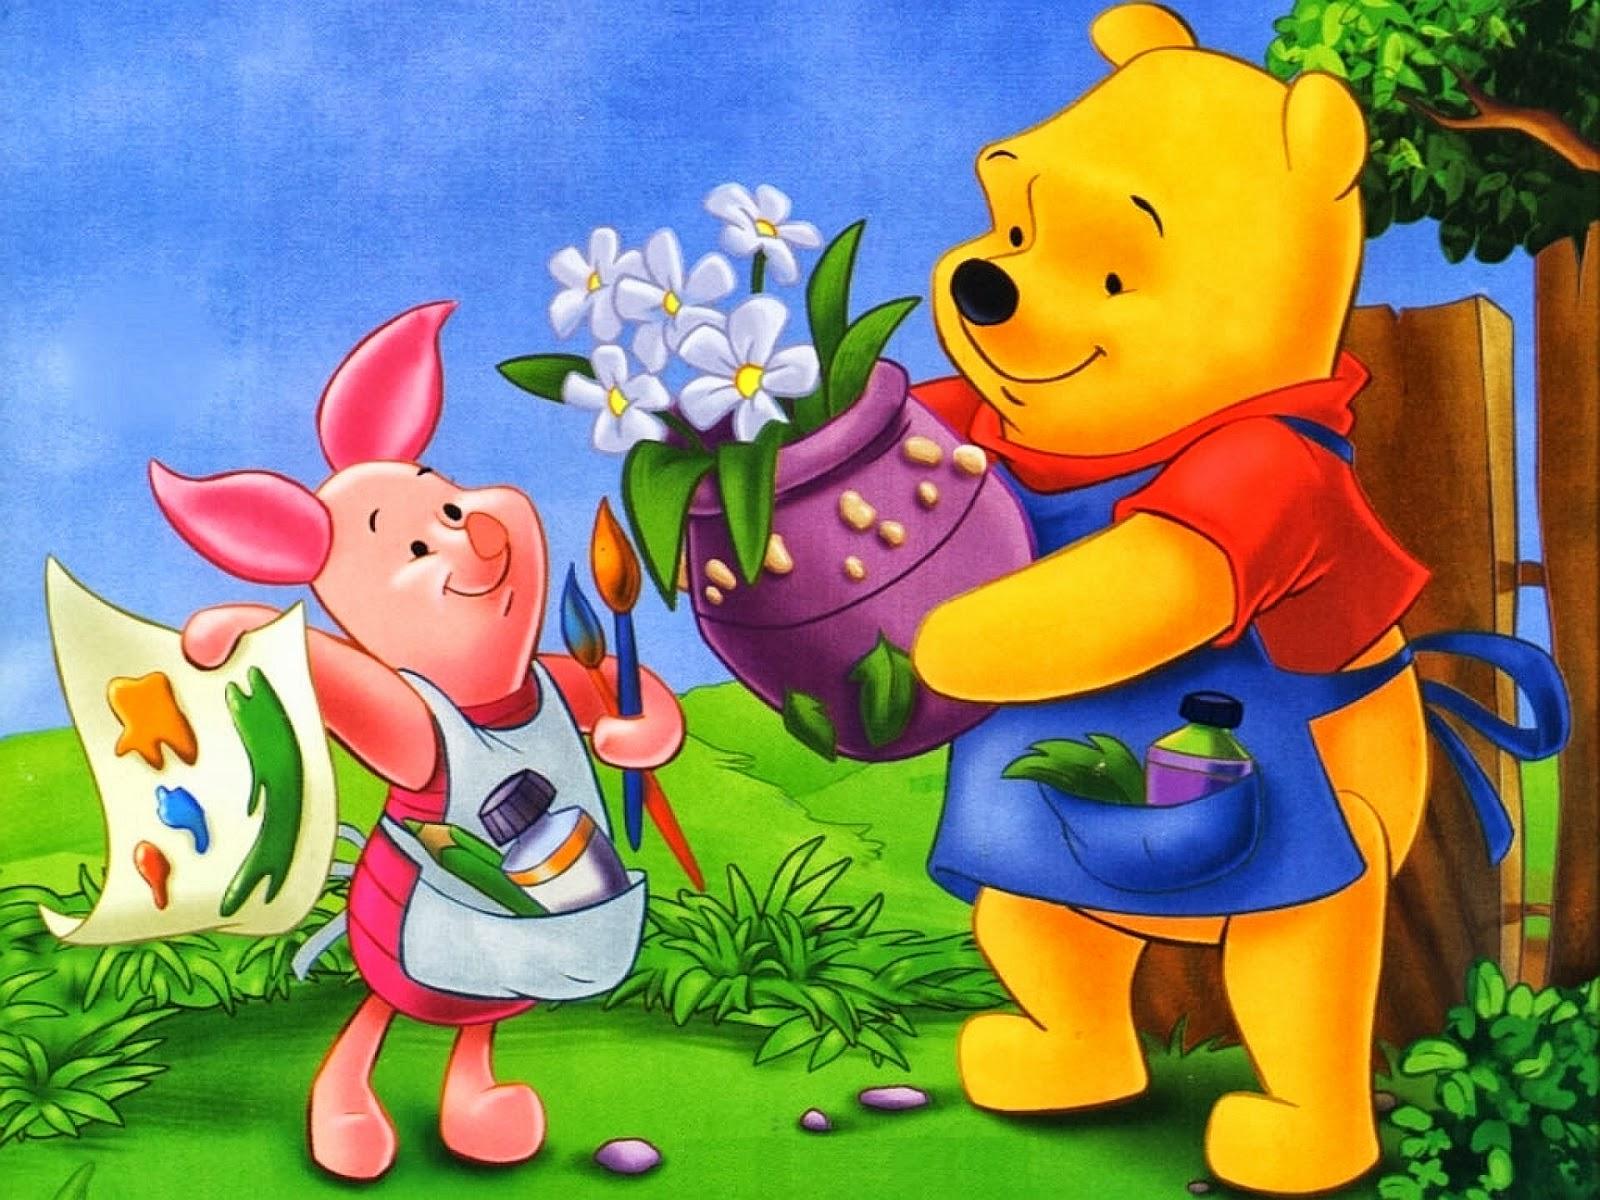 Disney HD Wallpapers Winnie The Pooh HD Wallpapers